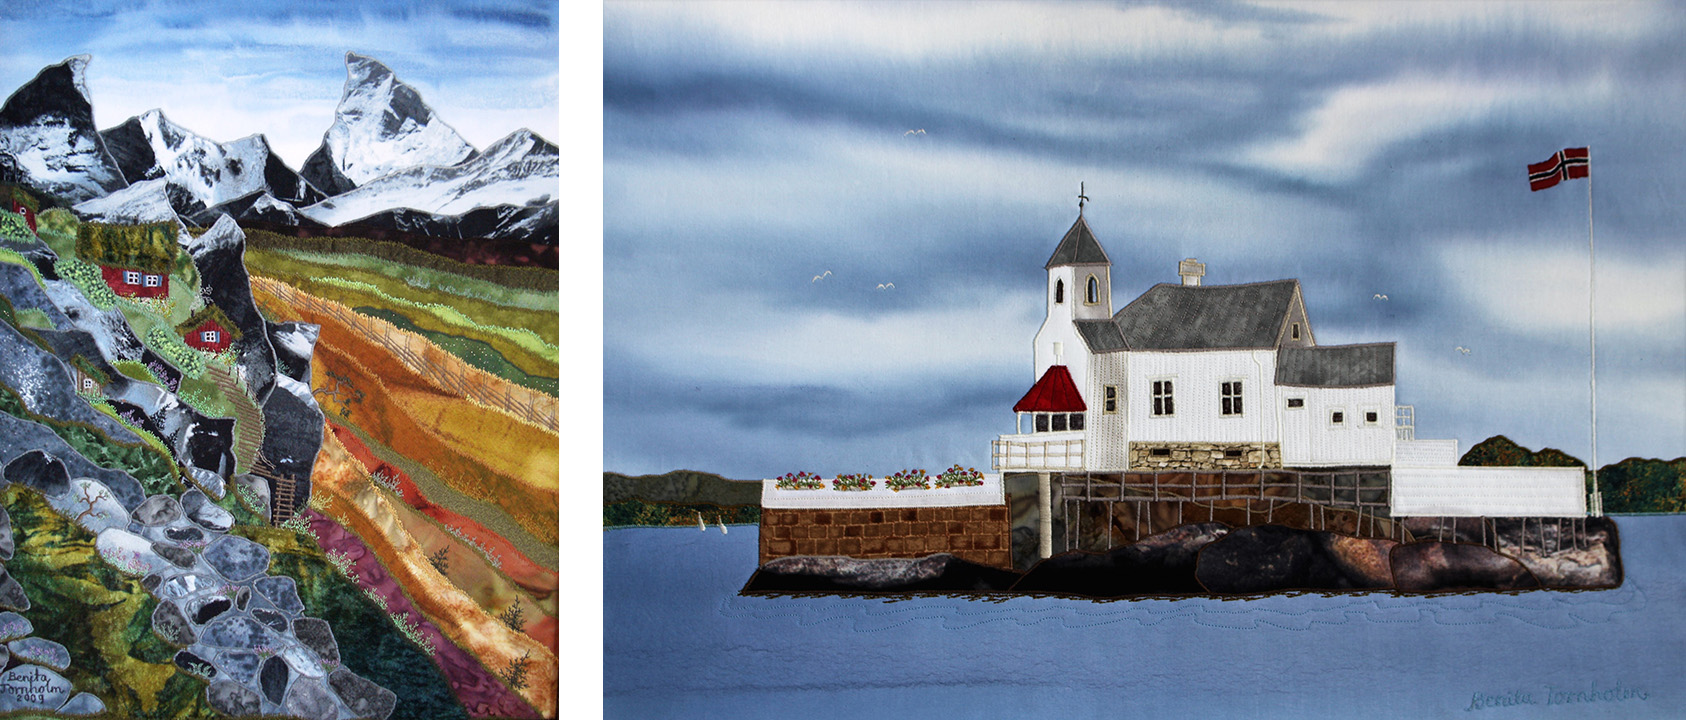 BenitaTornholm_7_mountain farm_6_The Dyna Lighthouse